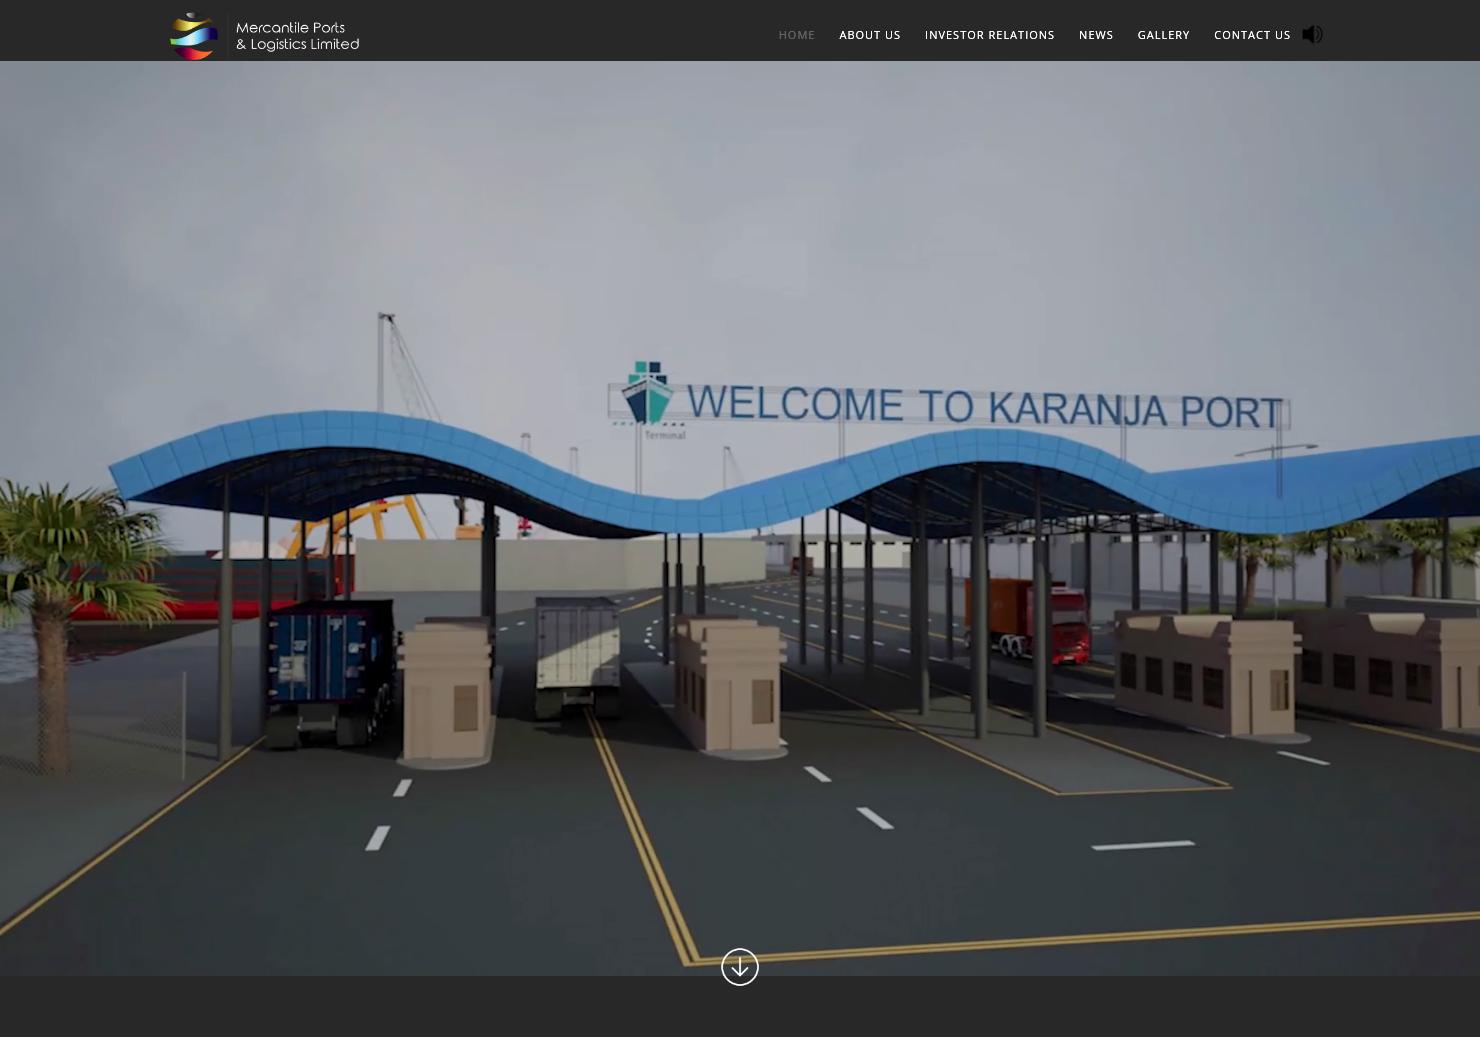 Mercantile Ports & Logistics Home Page